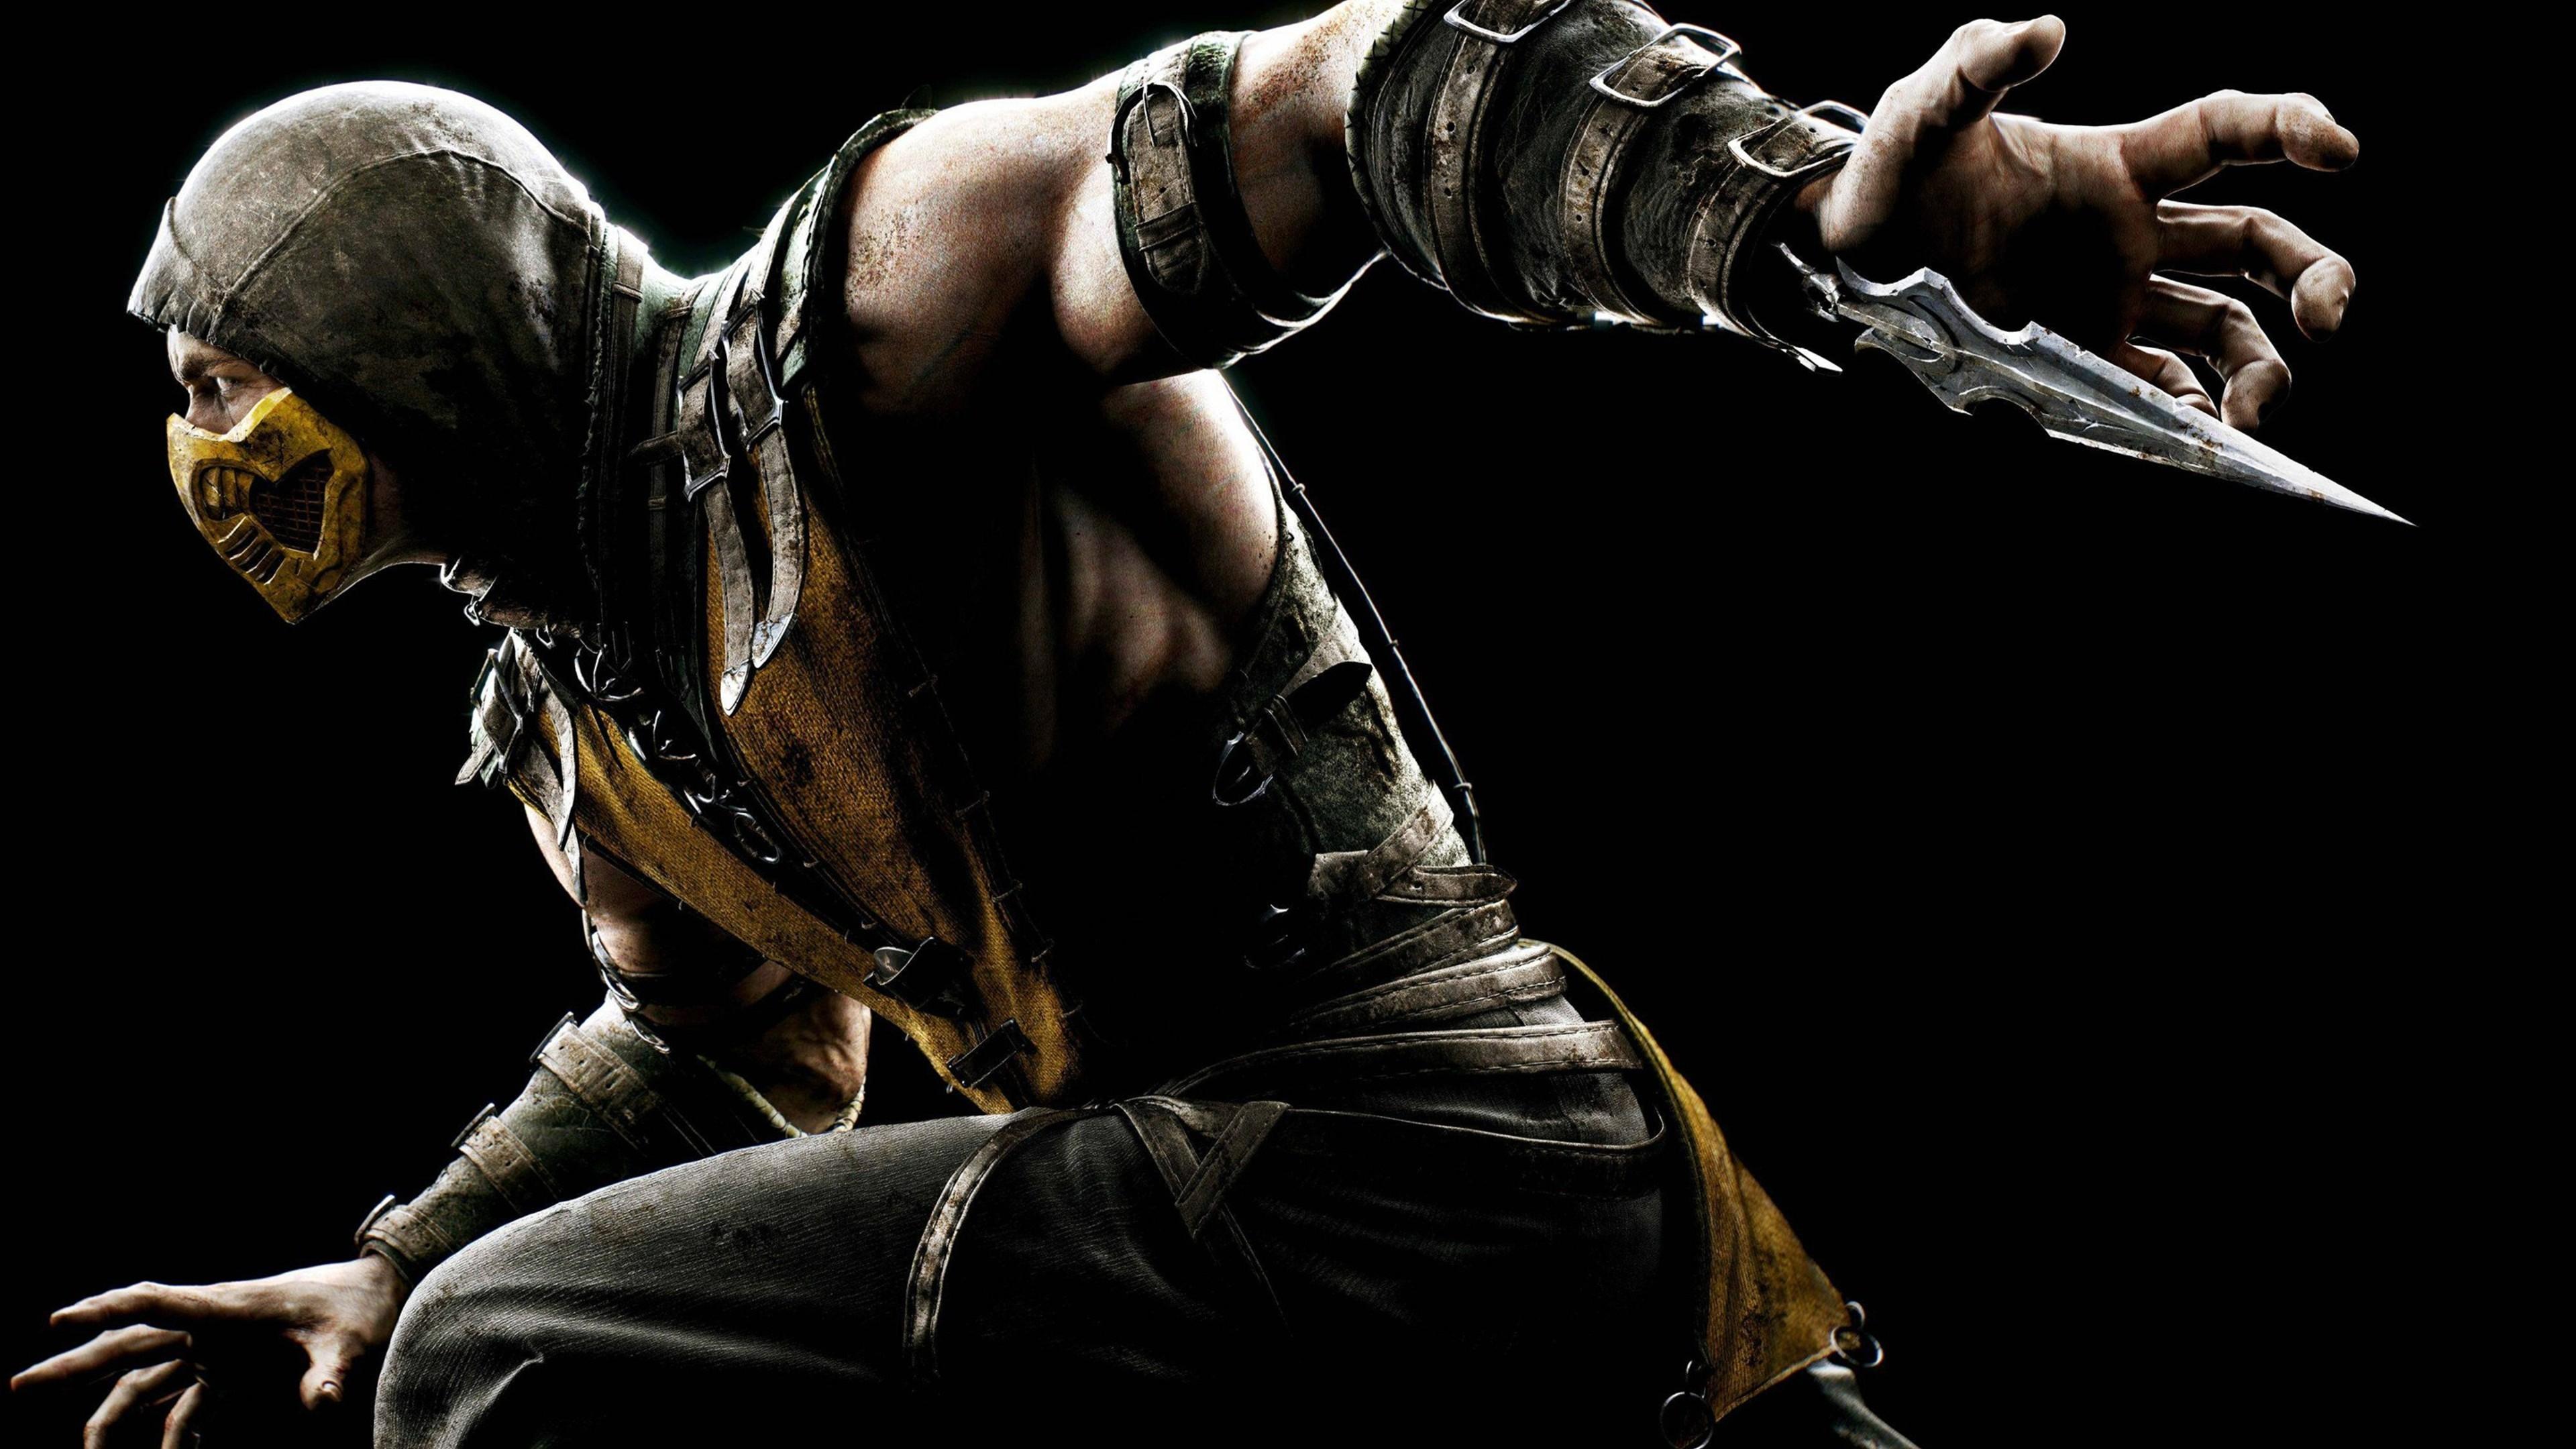 Mortal Kombat X Scorpion 2048×1152 Resolution